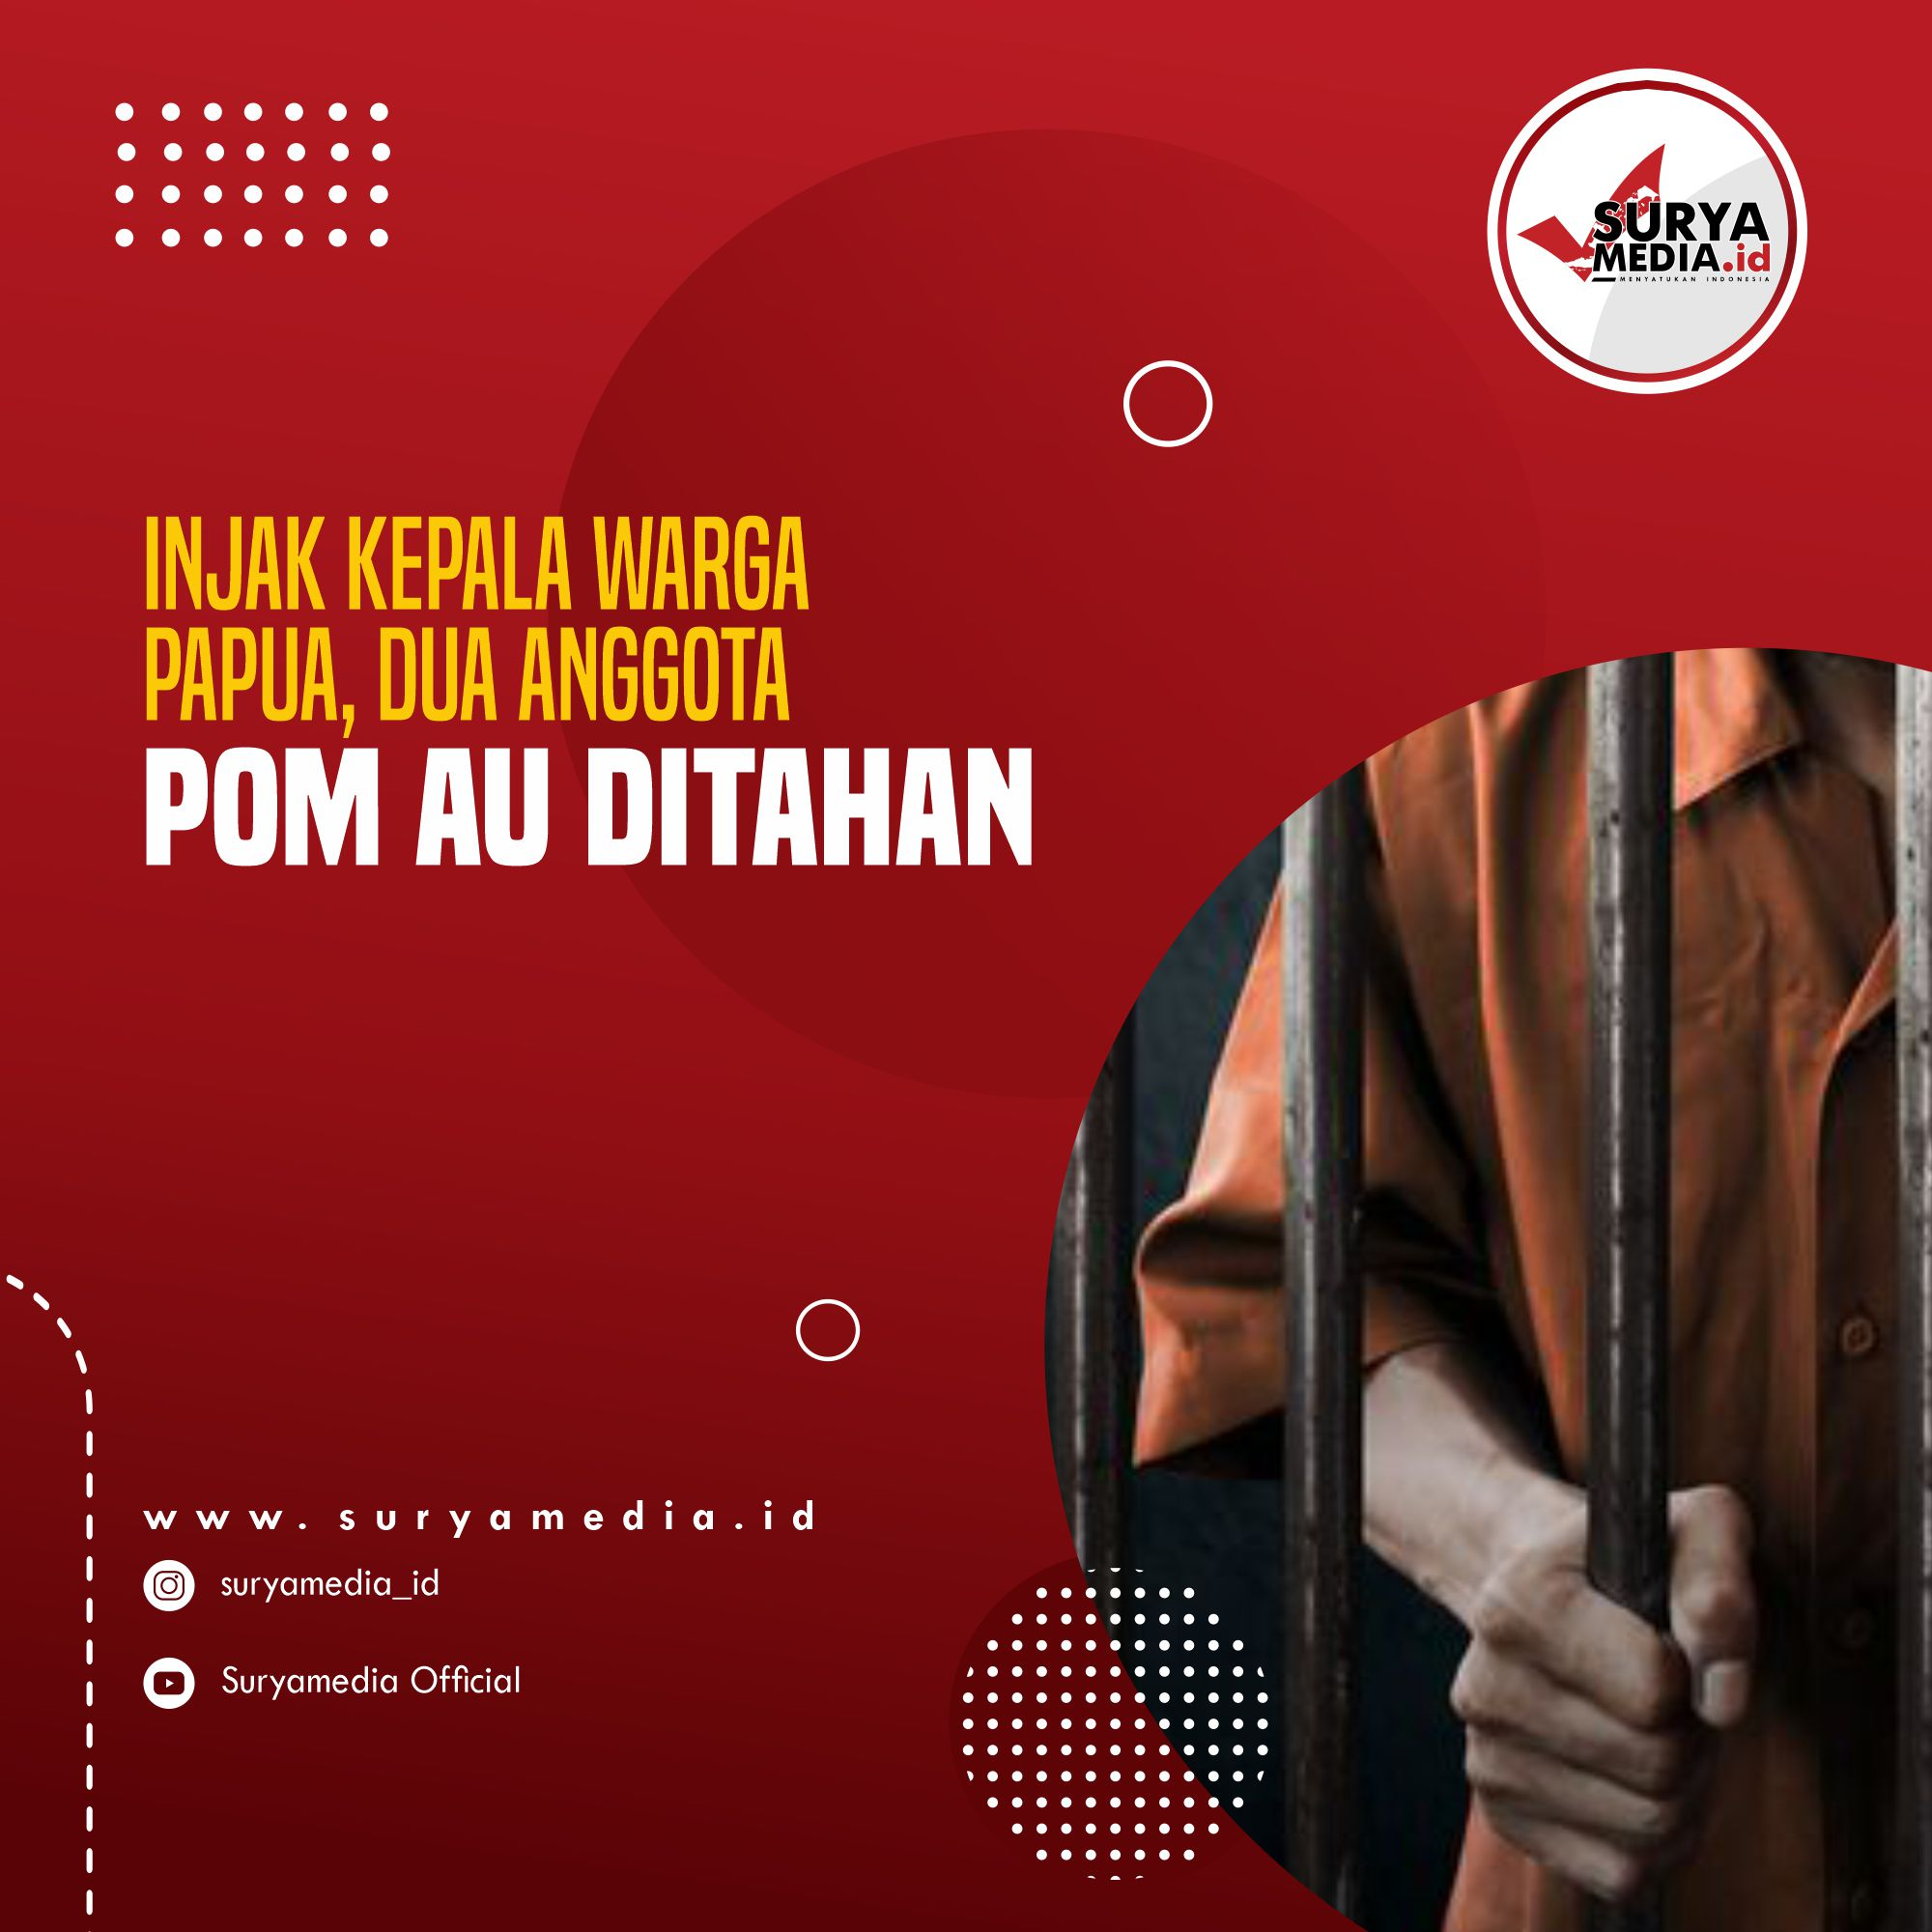 Injak Kepala Warga Papua, Dua Anggota POM AU Ditahan